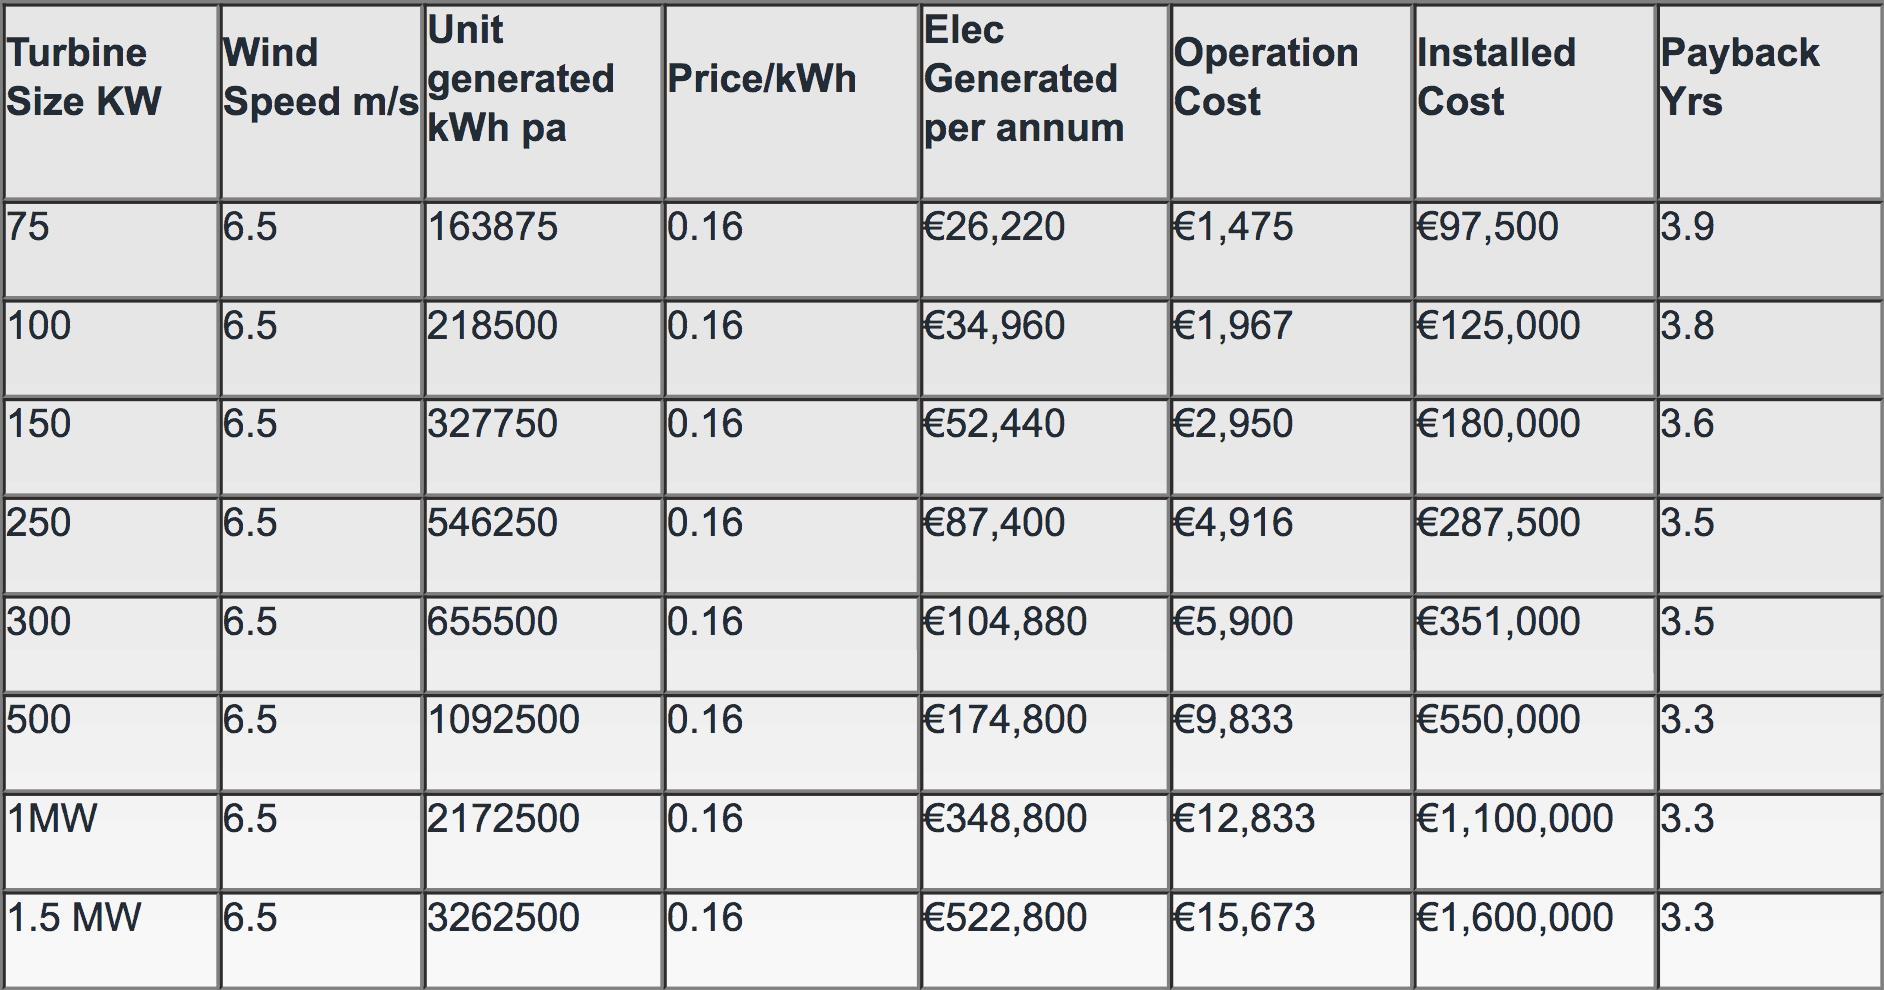 Refurbished Wind Turbine Ireland Payback by Enerpower